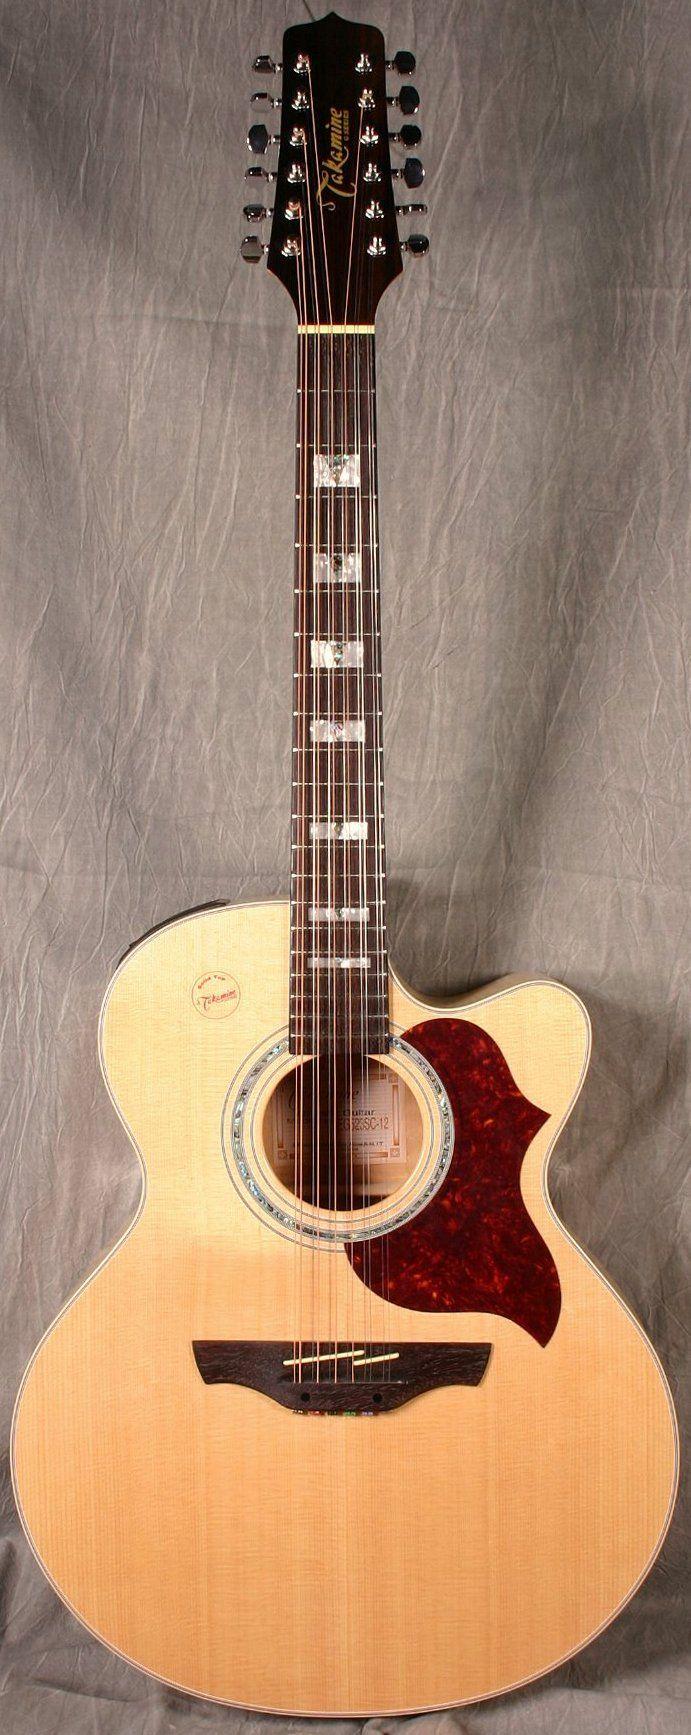 frettedchordophones: Takamine Jumbo 12 string Guitar =Lardys Chordophone of the day - a year ago ==Lardys Chordophone of the day - 2 years ago --- https://www.pinterest.com/lardyfatboy/